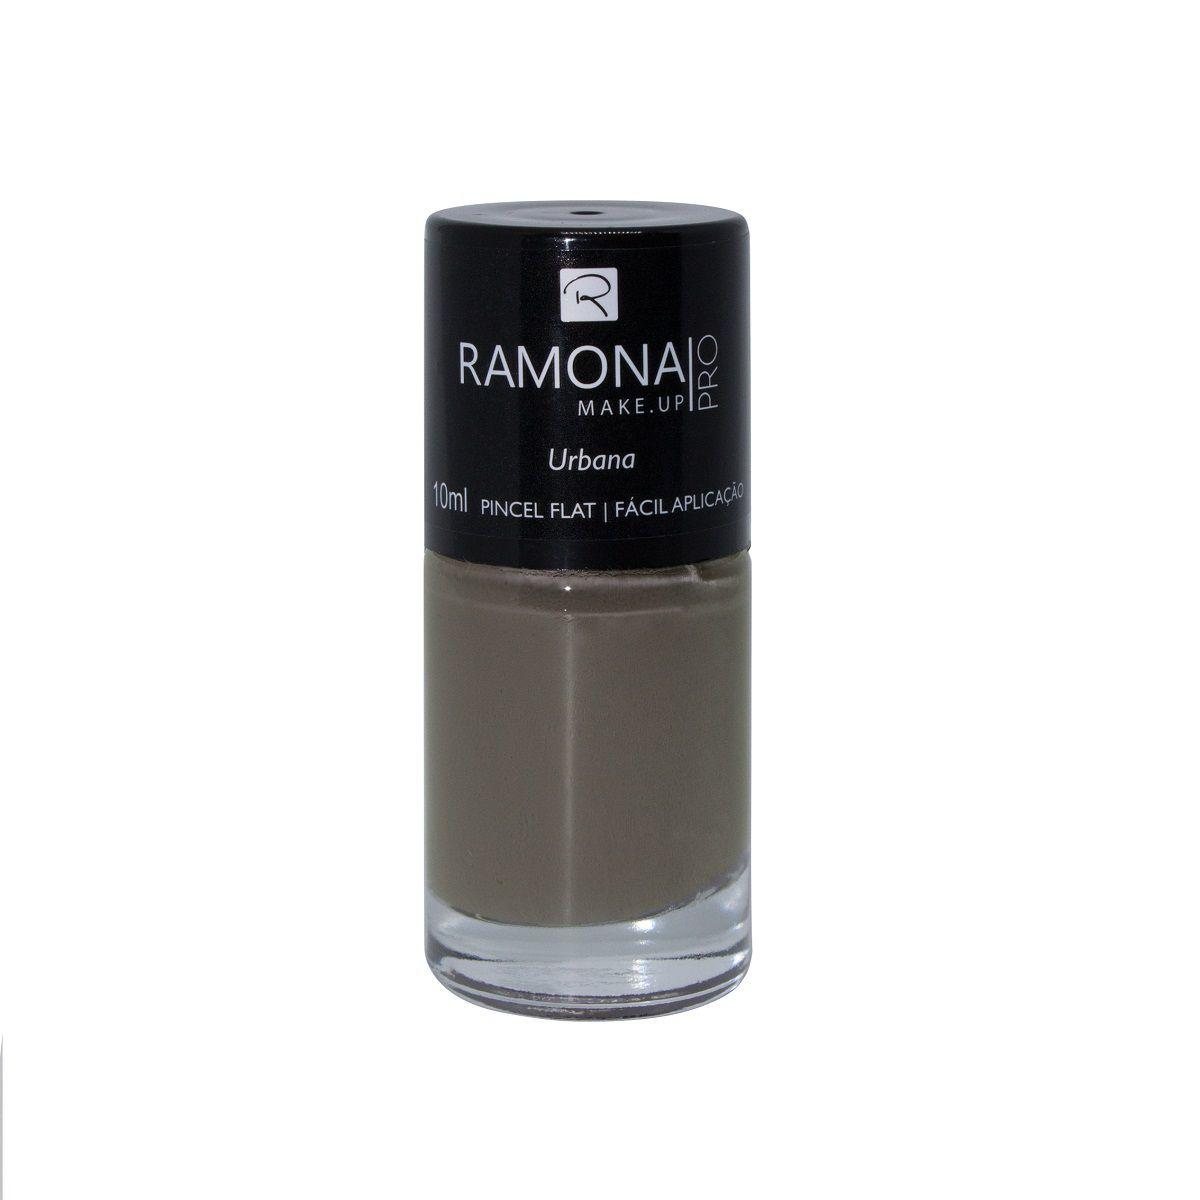 Esmalte cremoso Ramona Cosméticos Urbana 10ml